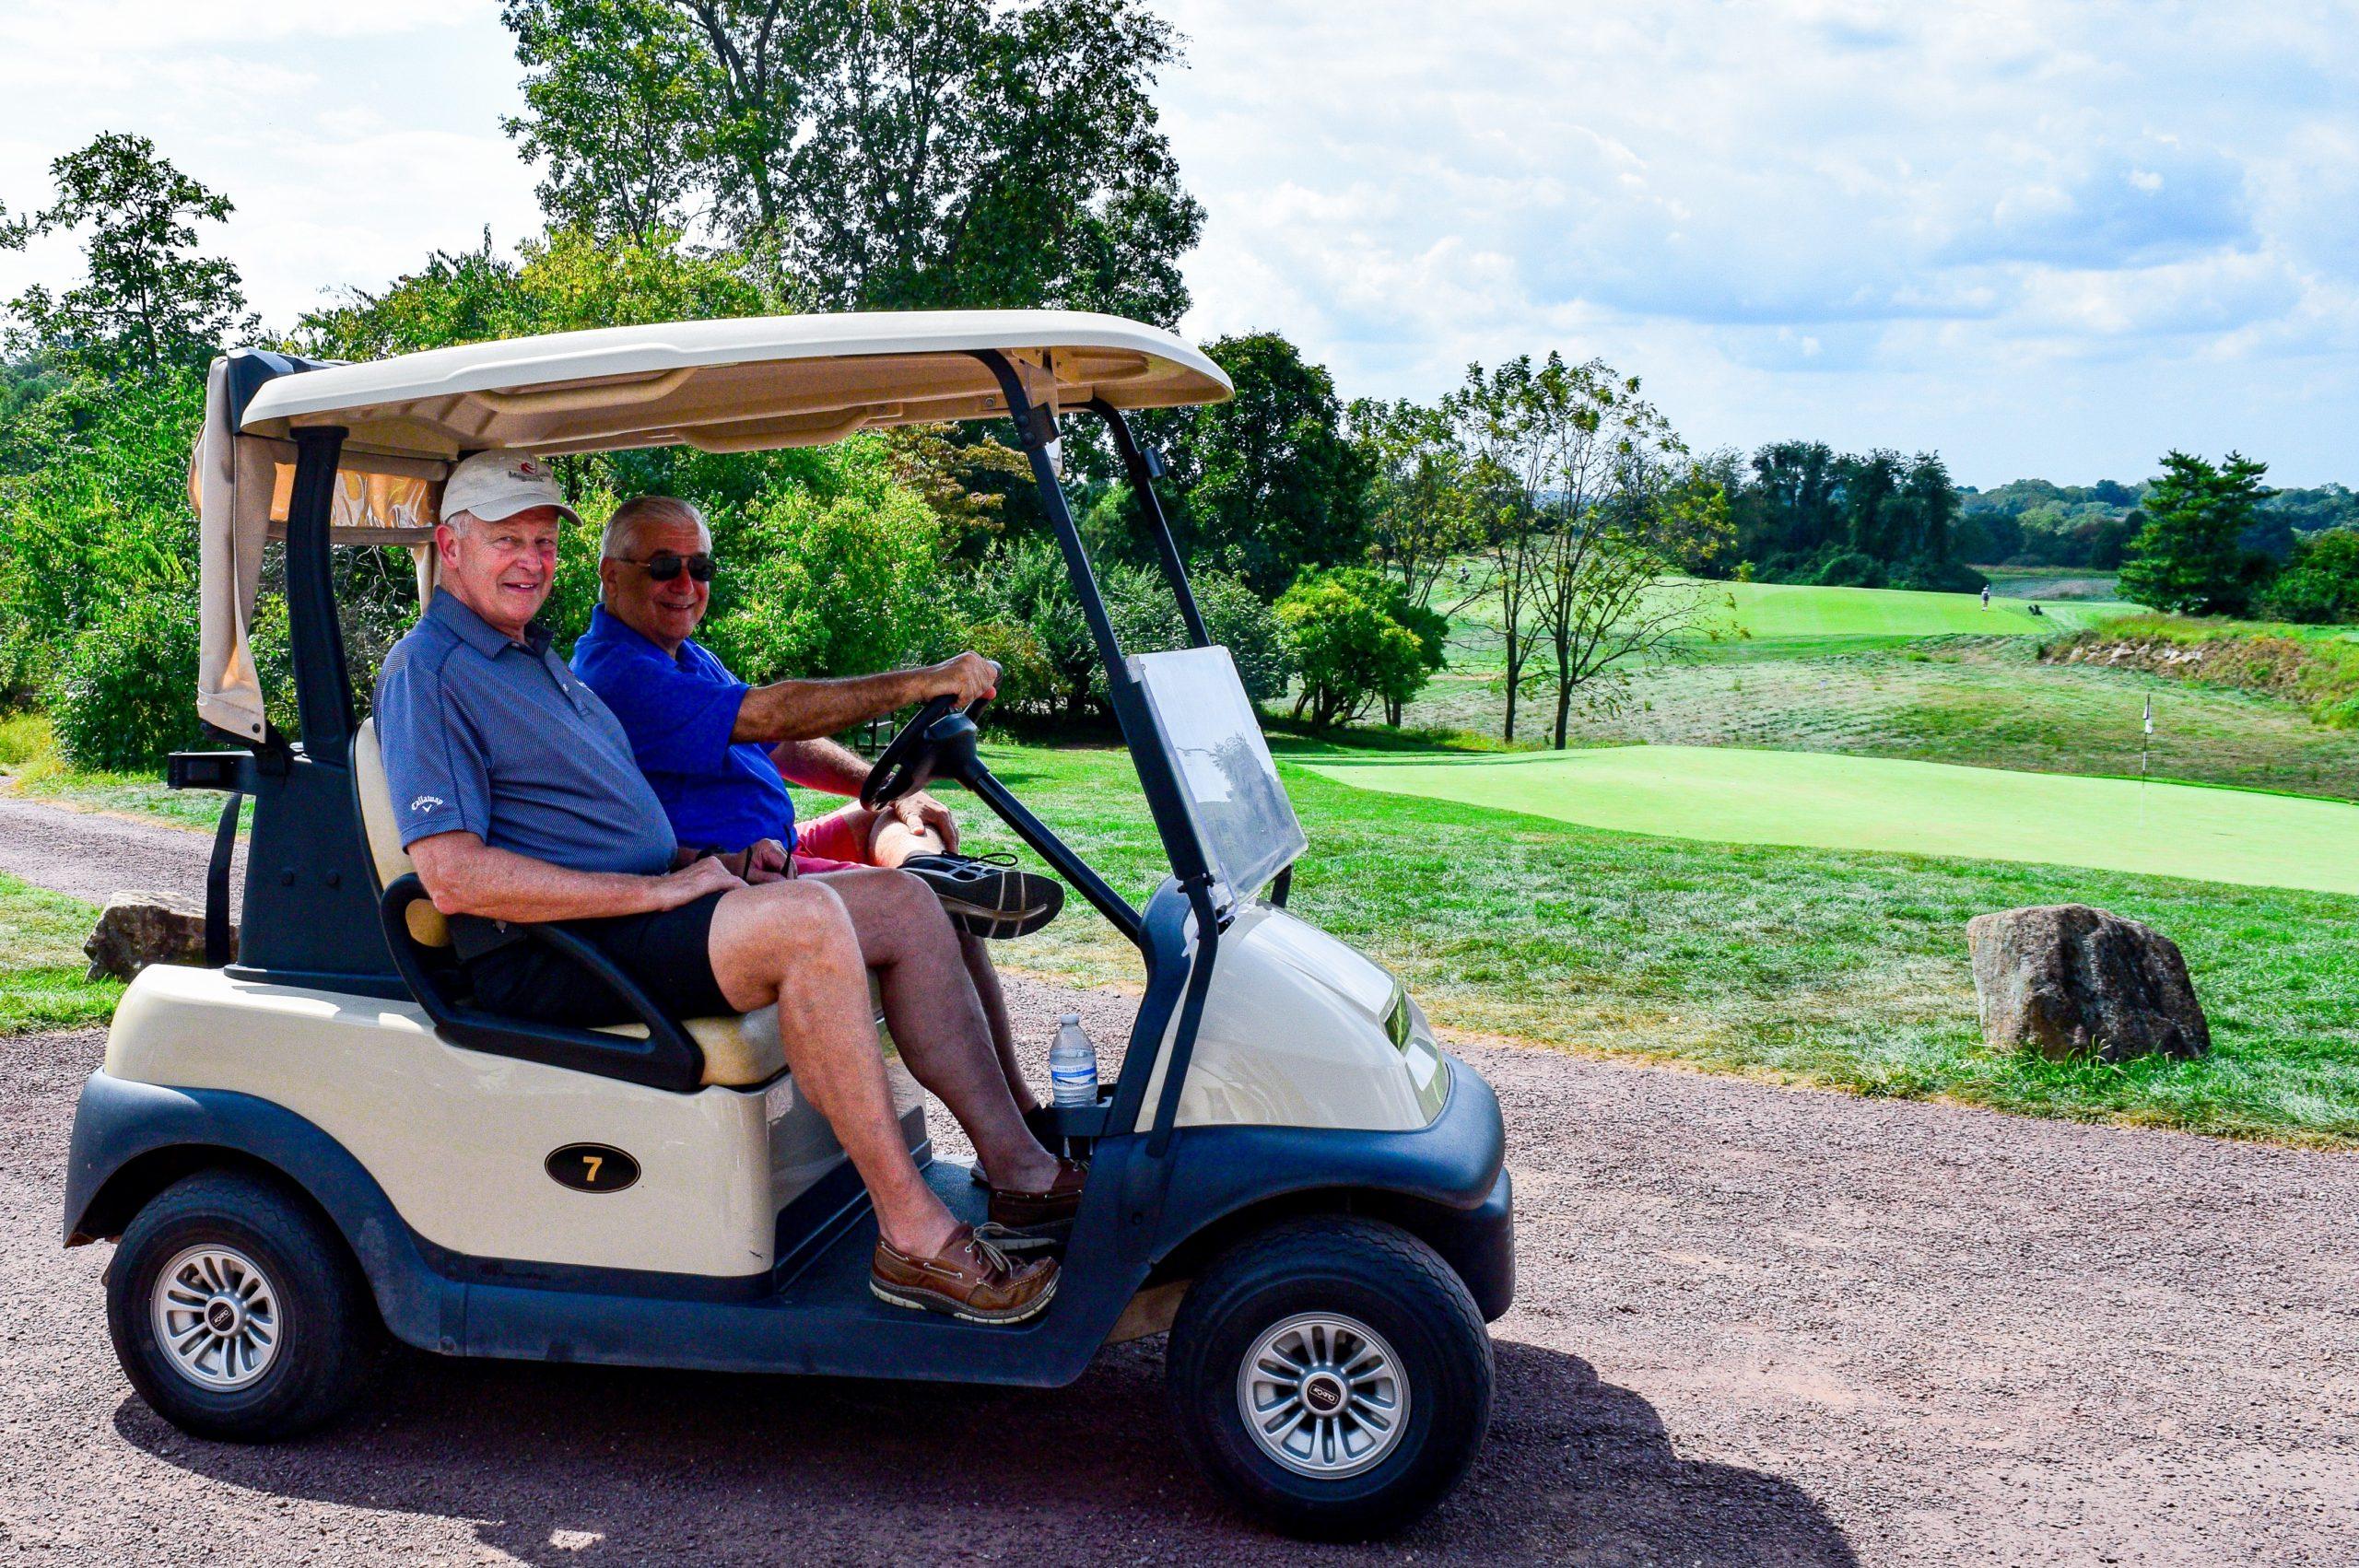 Meridian Bank Golf Classic Raises $55,000 for Surrey's Transportation Division